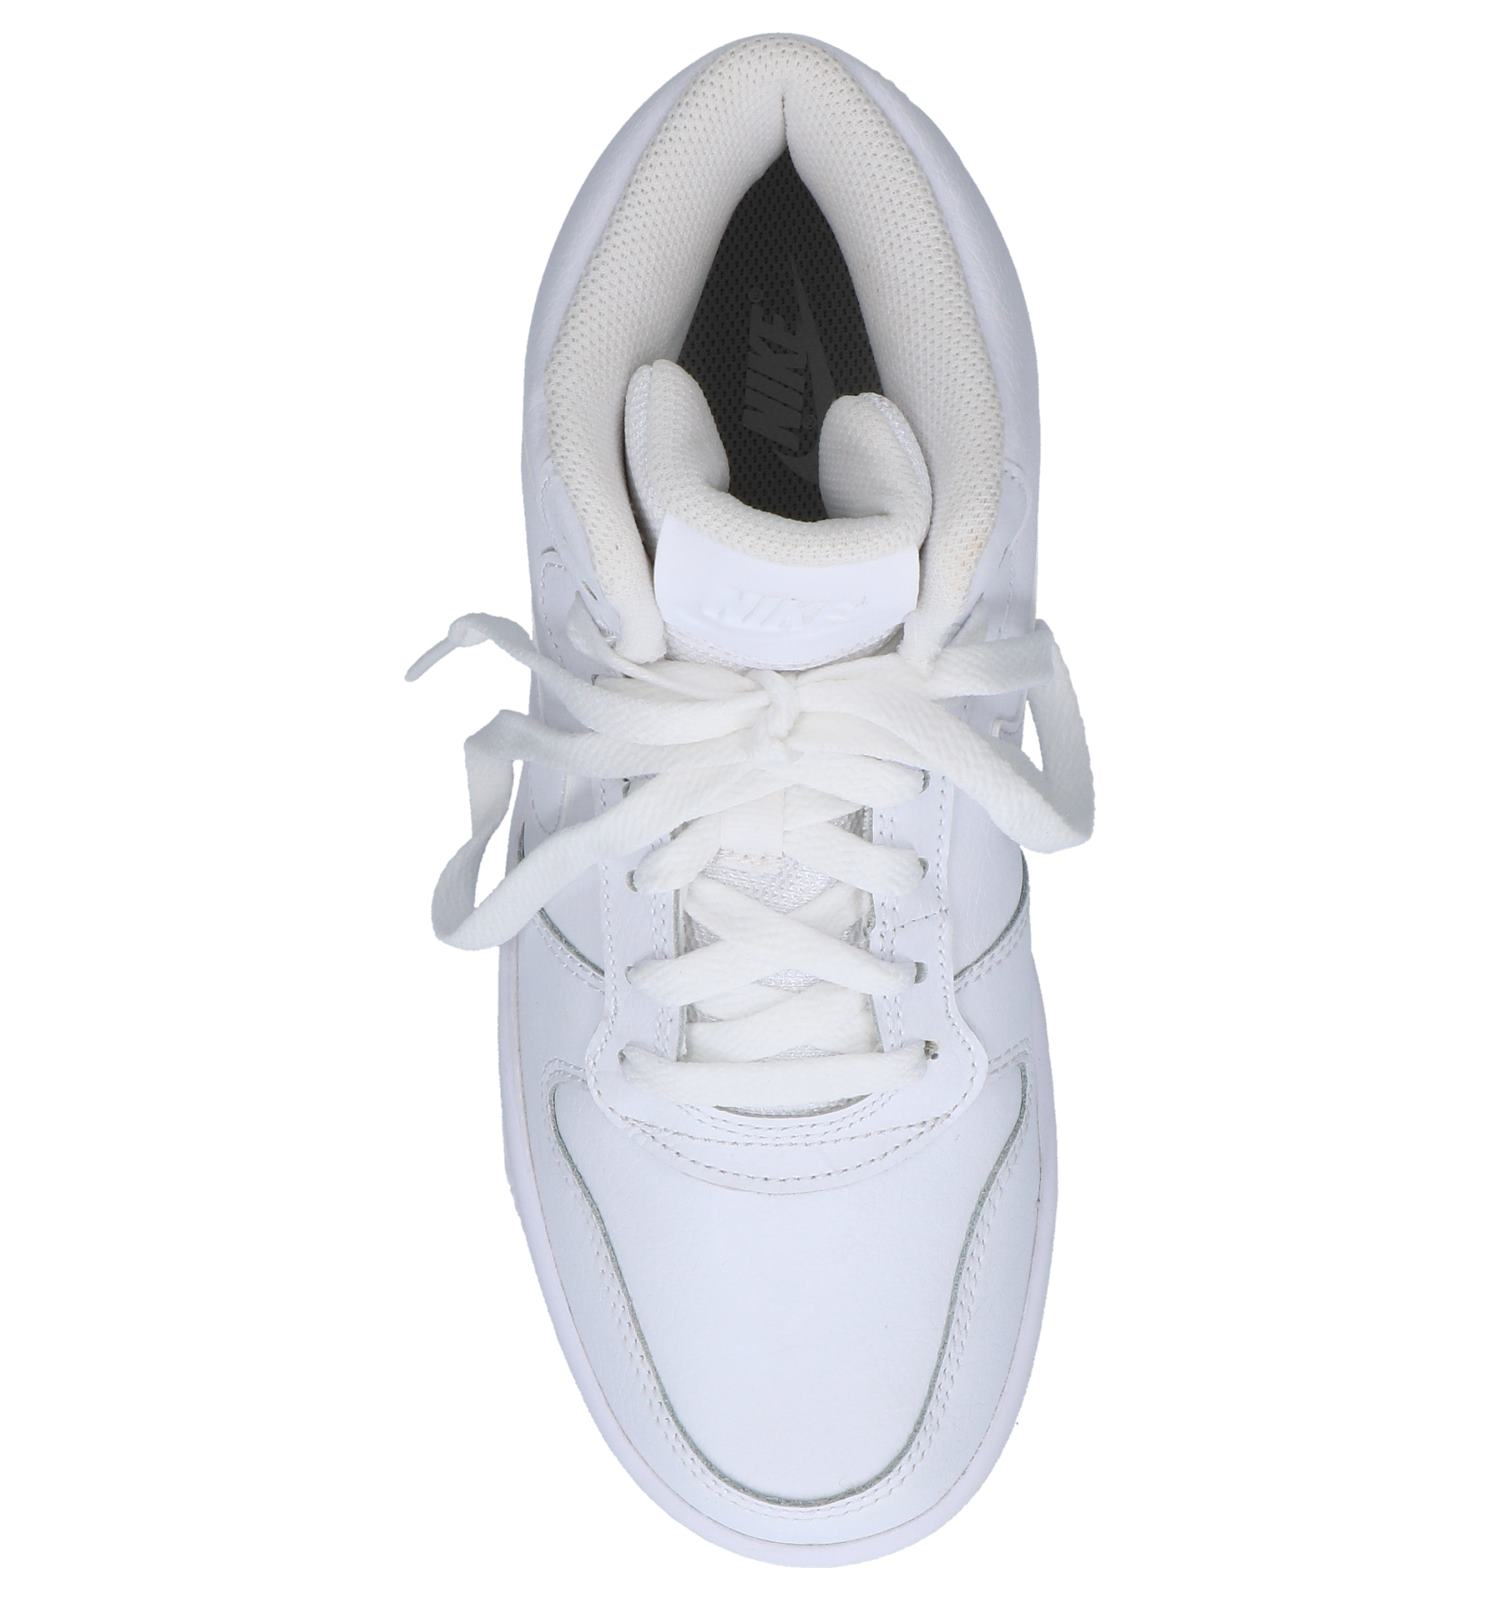 49a650090cd Nike Ebernon Mid Witte Hoge Sneakers | TORFS.BE | Gratis verzend en retour